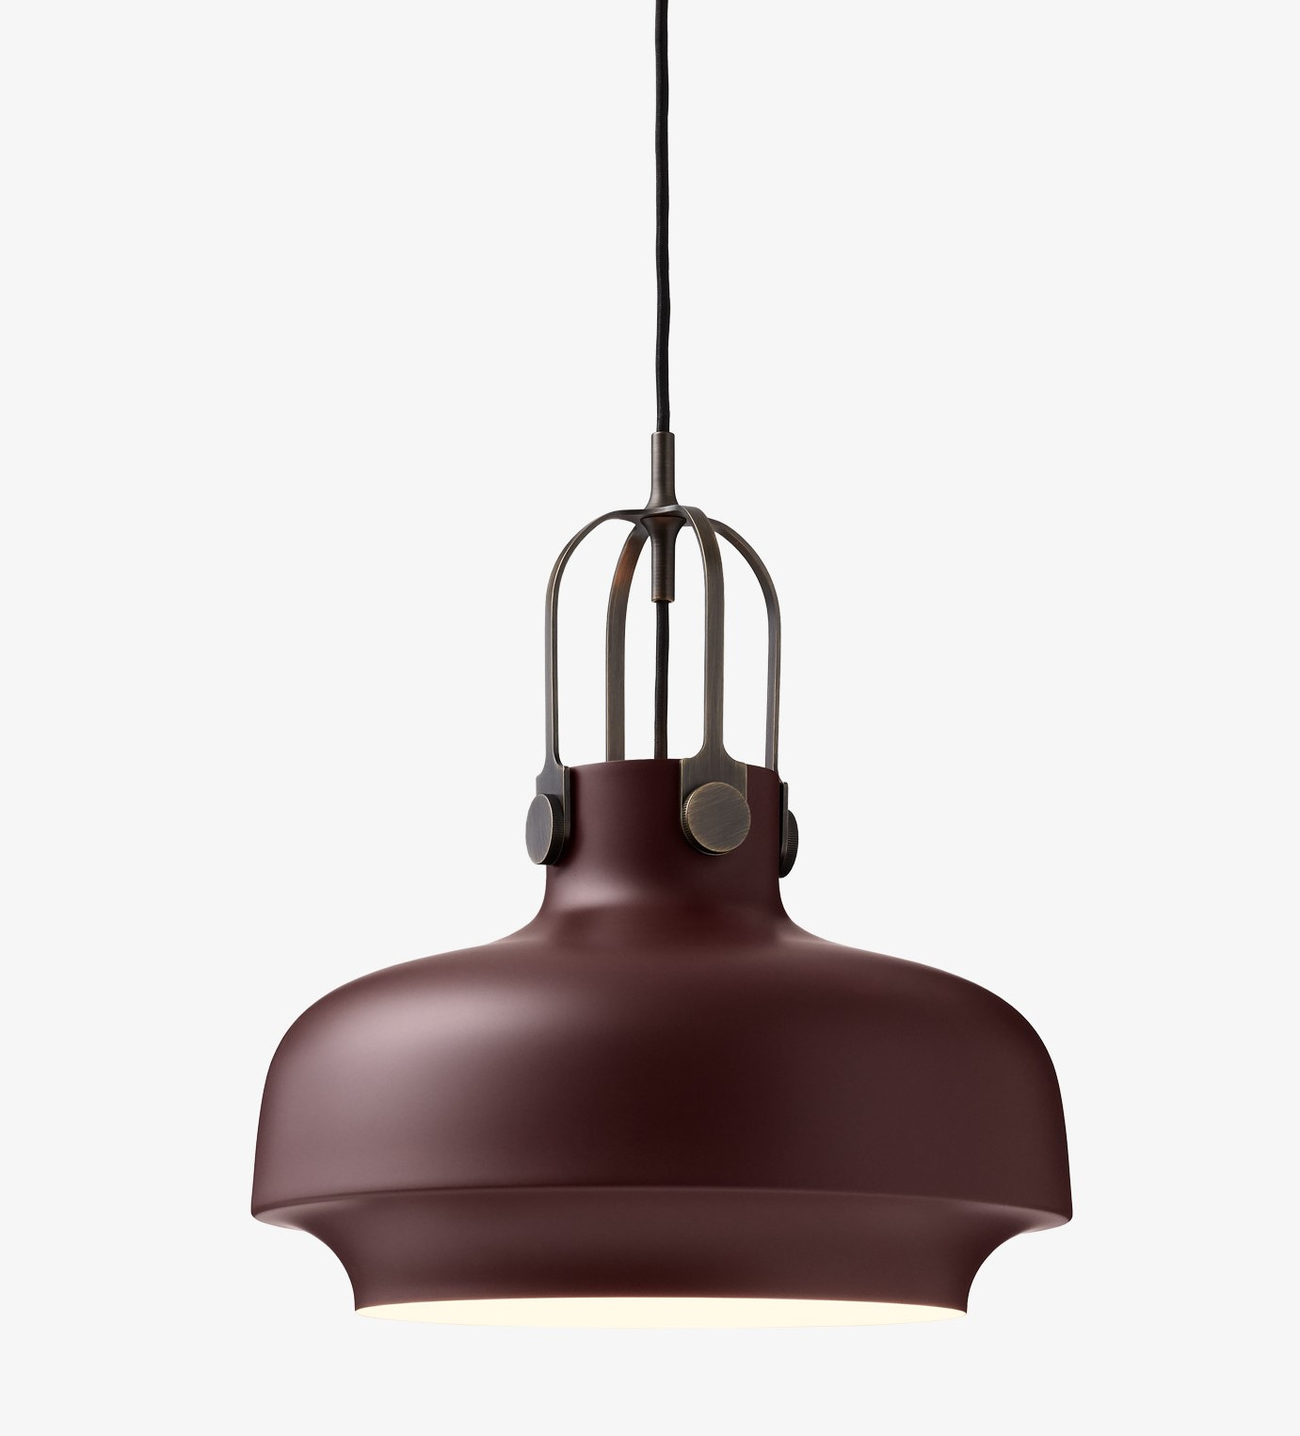 tradition Copenhagen hanglamp SC7 Plum